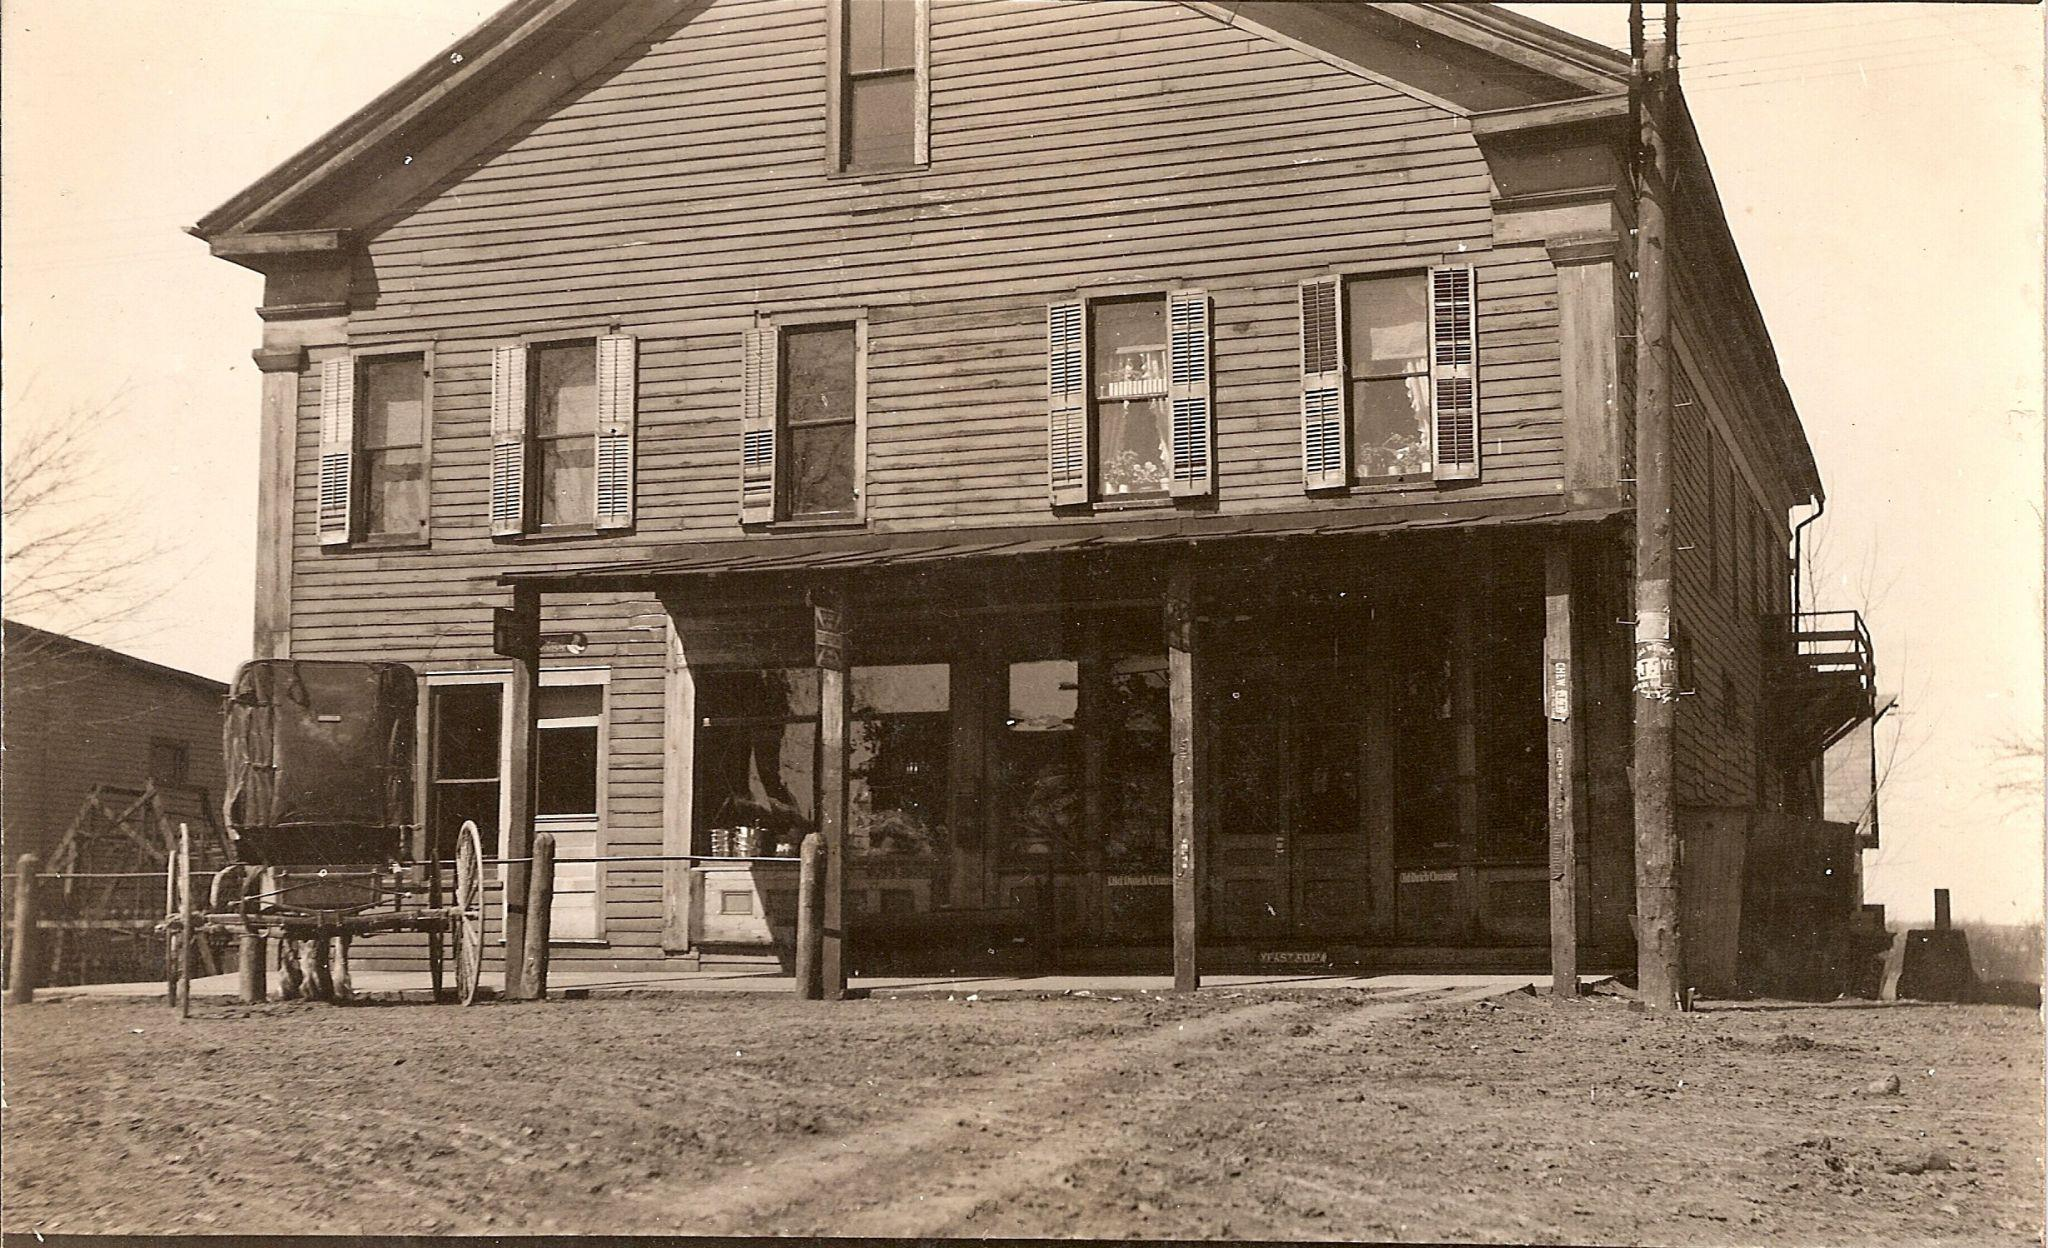 Holmes County Historical Society